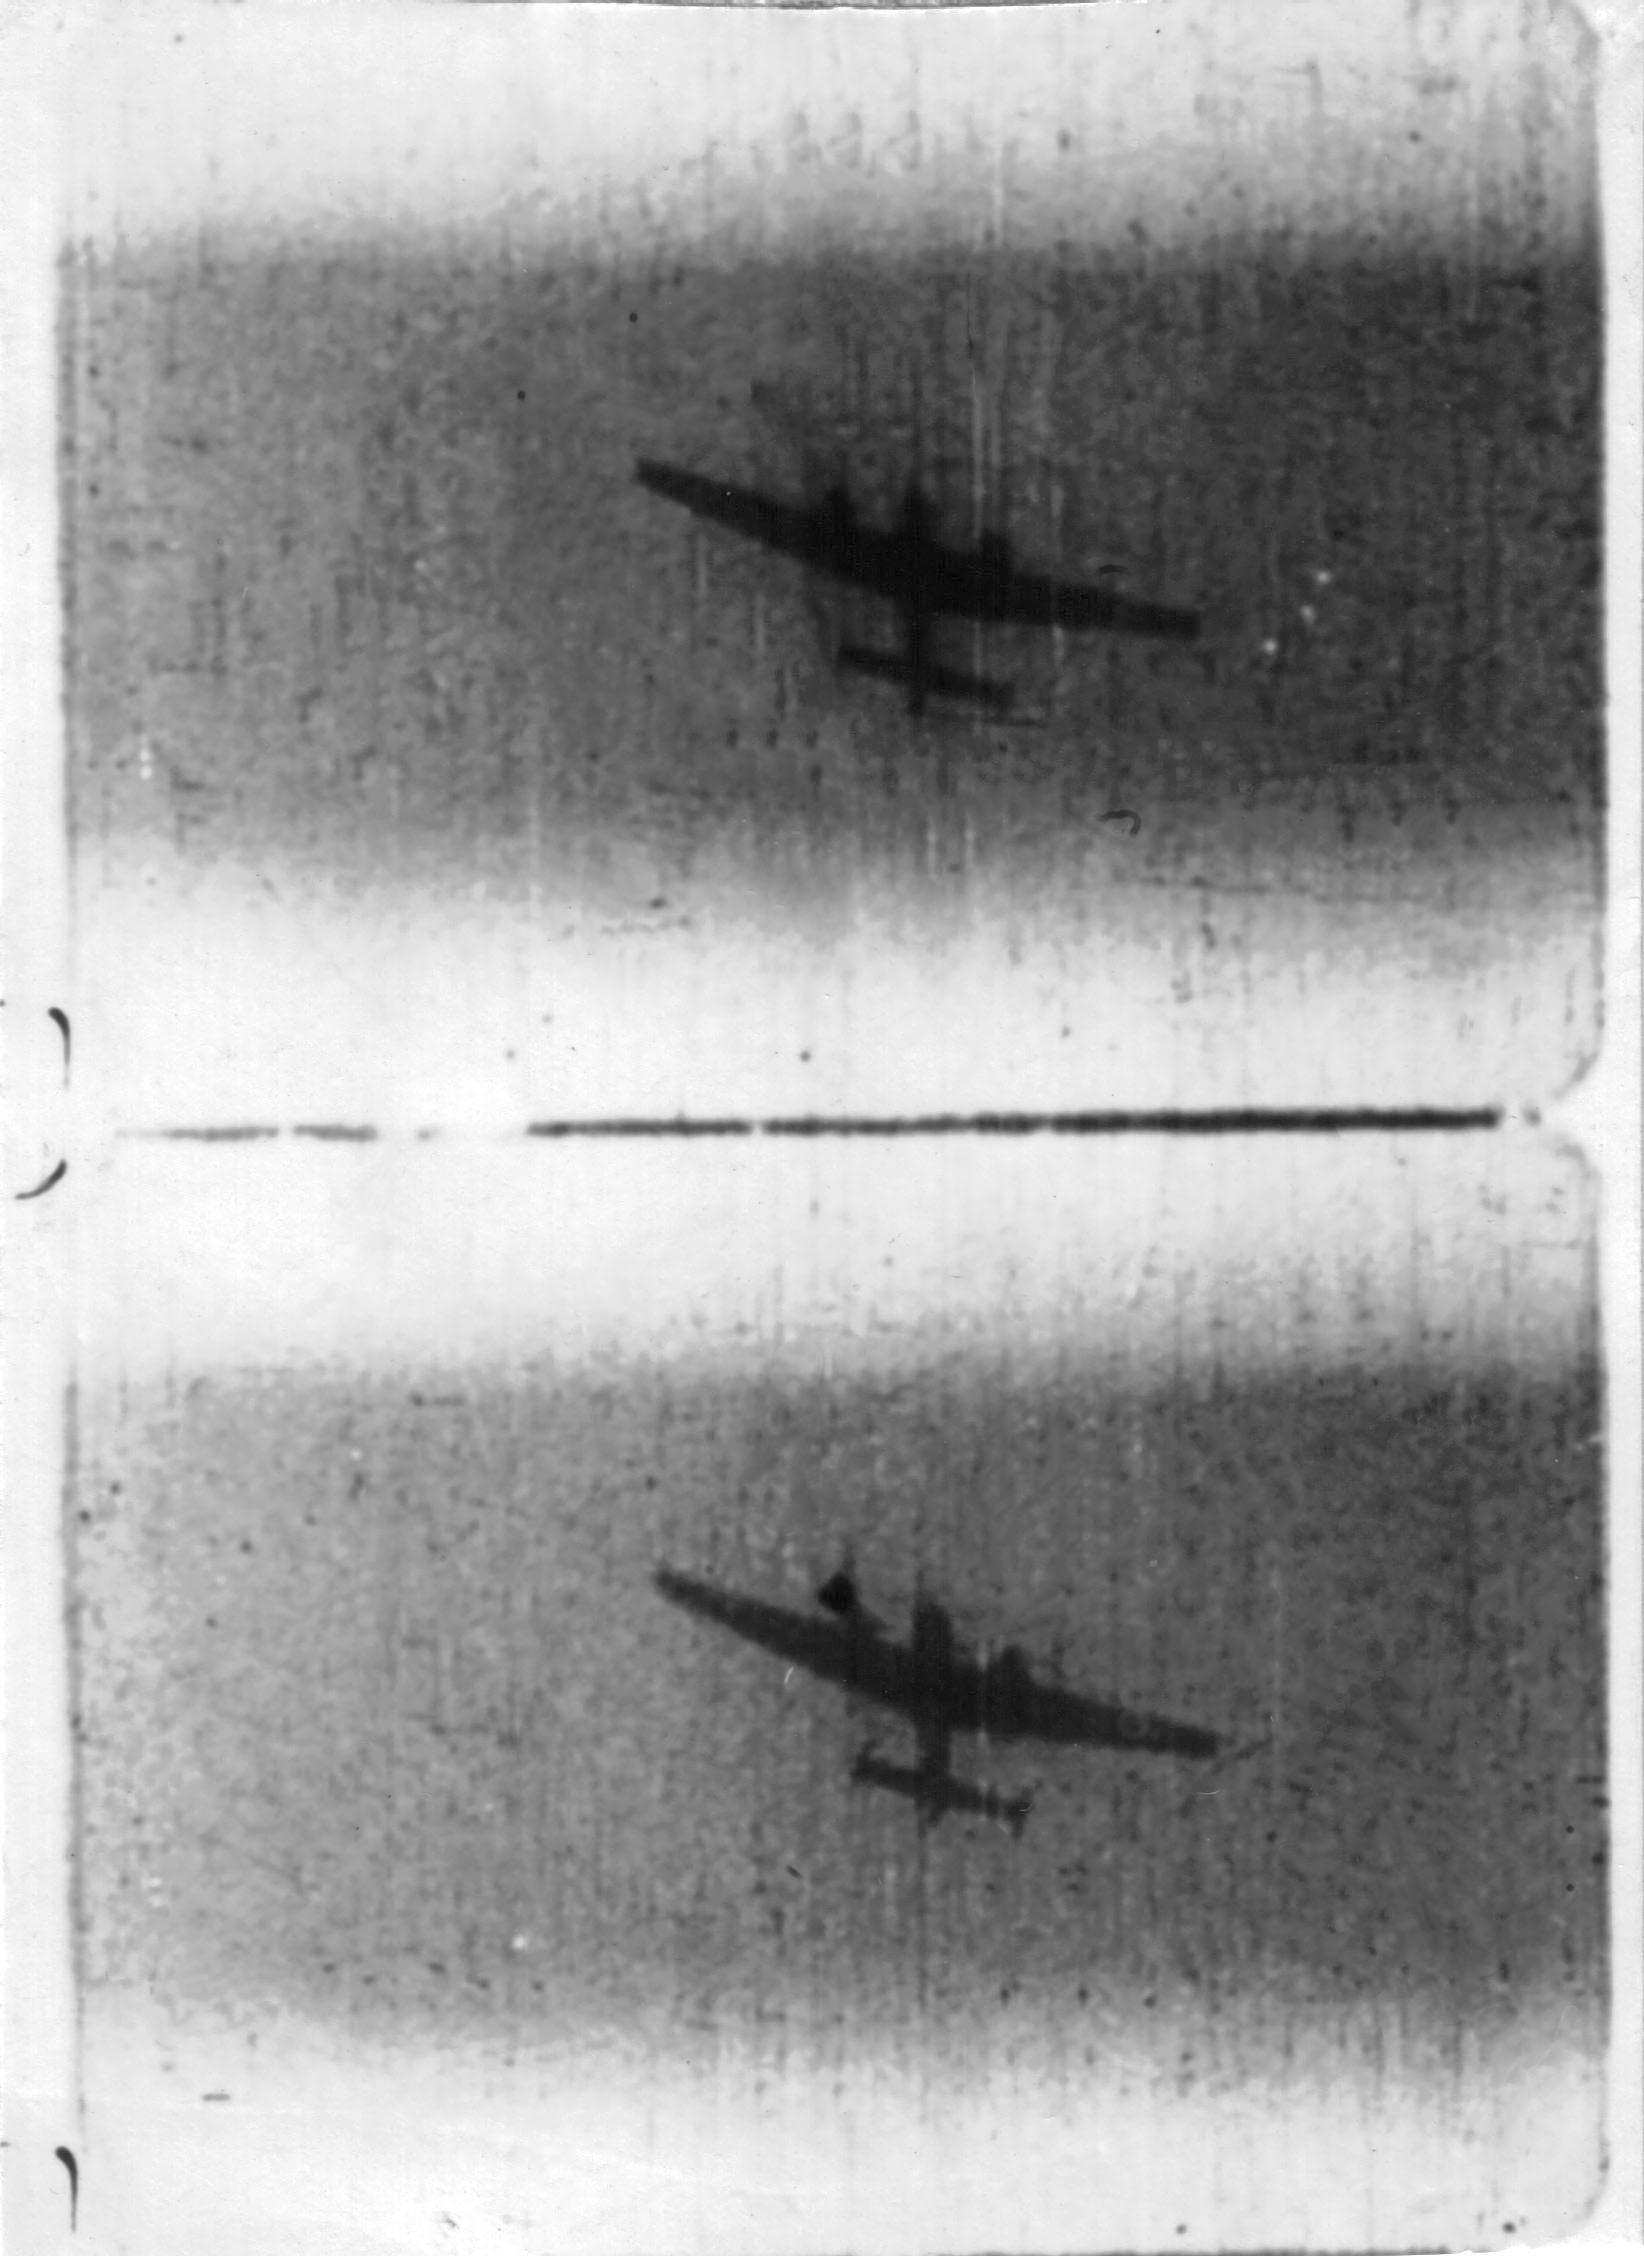 BW photos Ted Shipman Spitfire gun camera film Bf 110 over Barnard Castle County Durham 15th Aug 1940 01